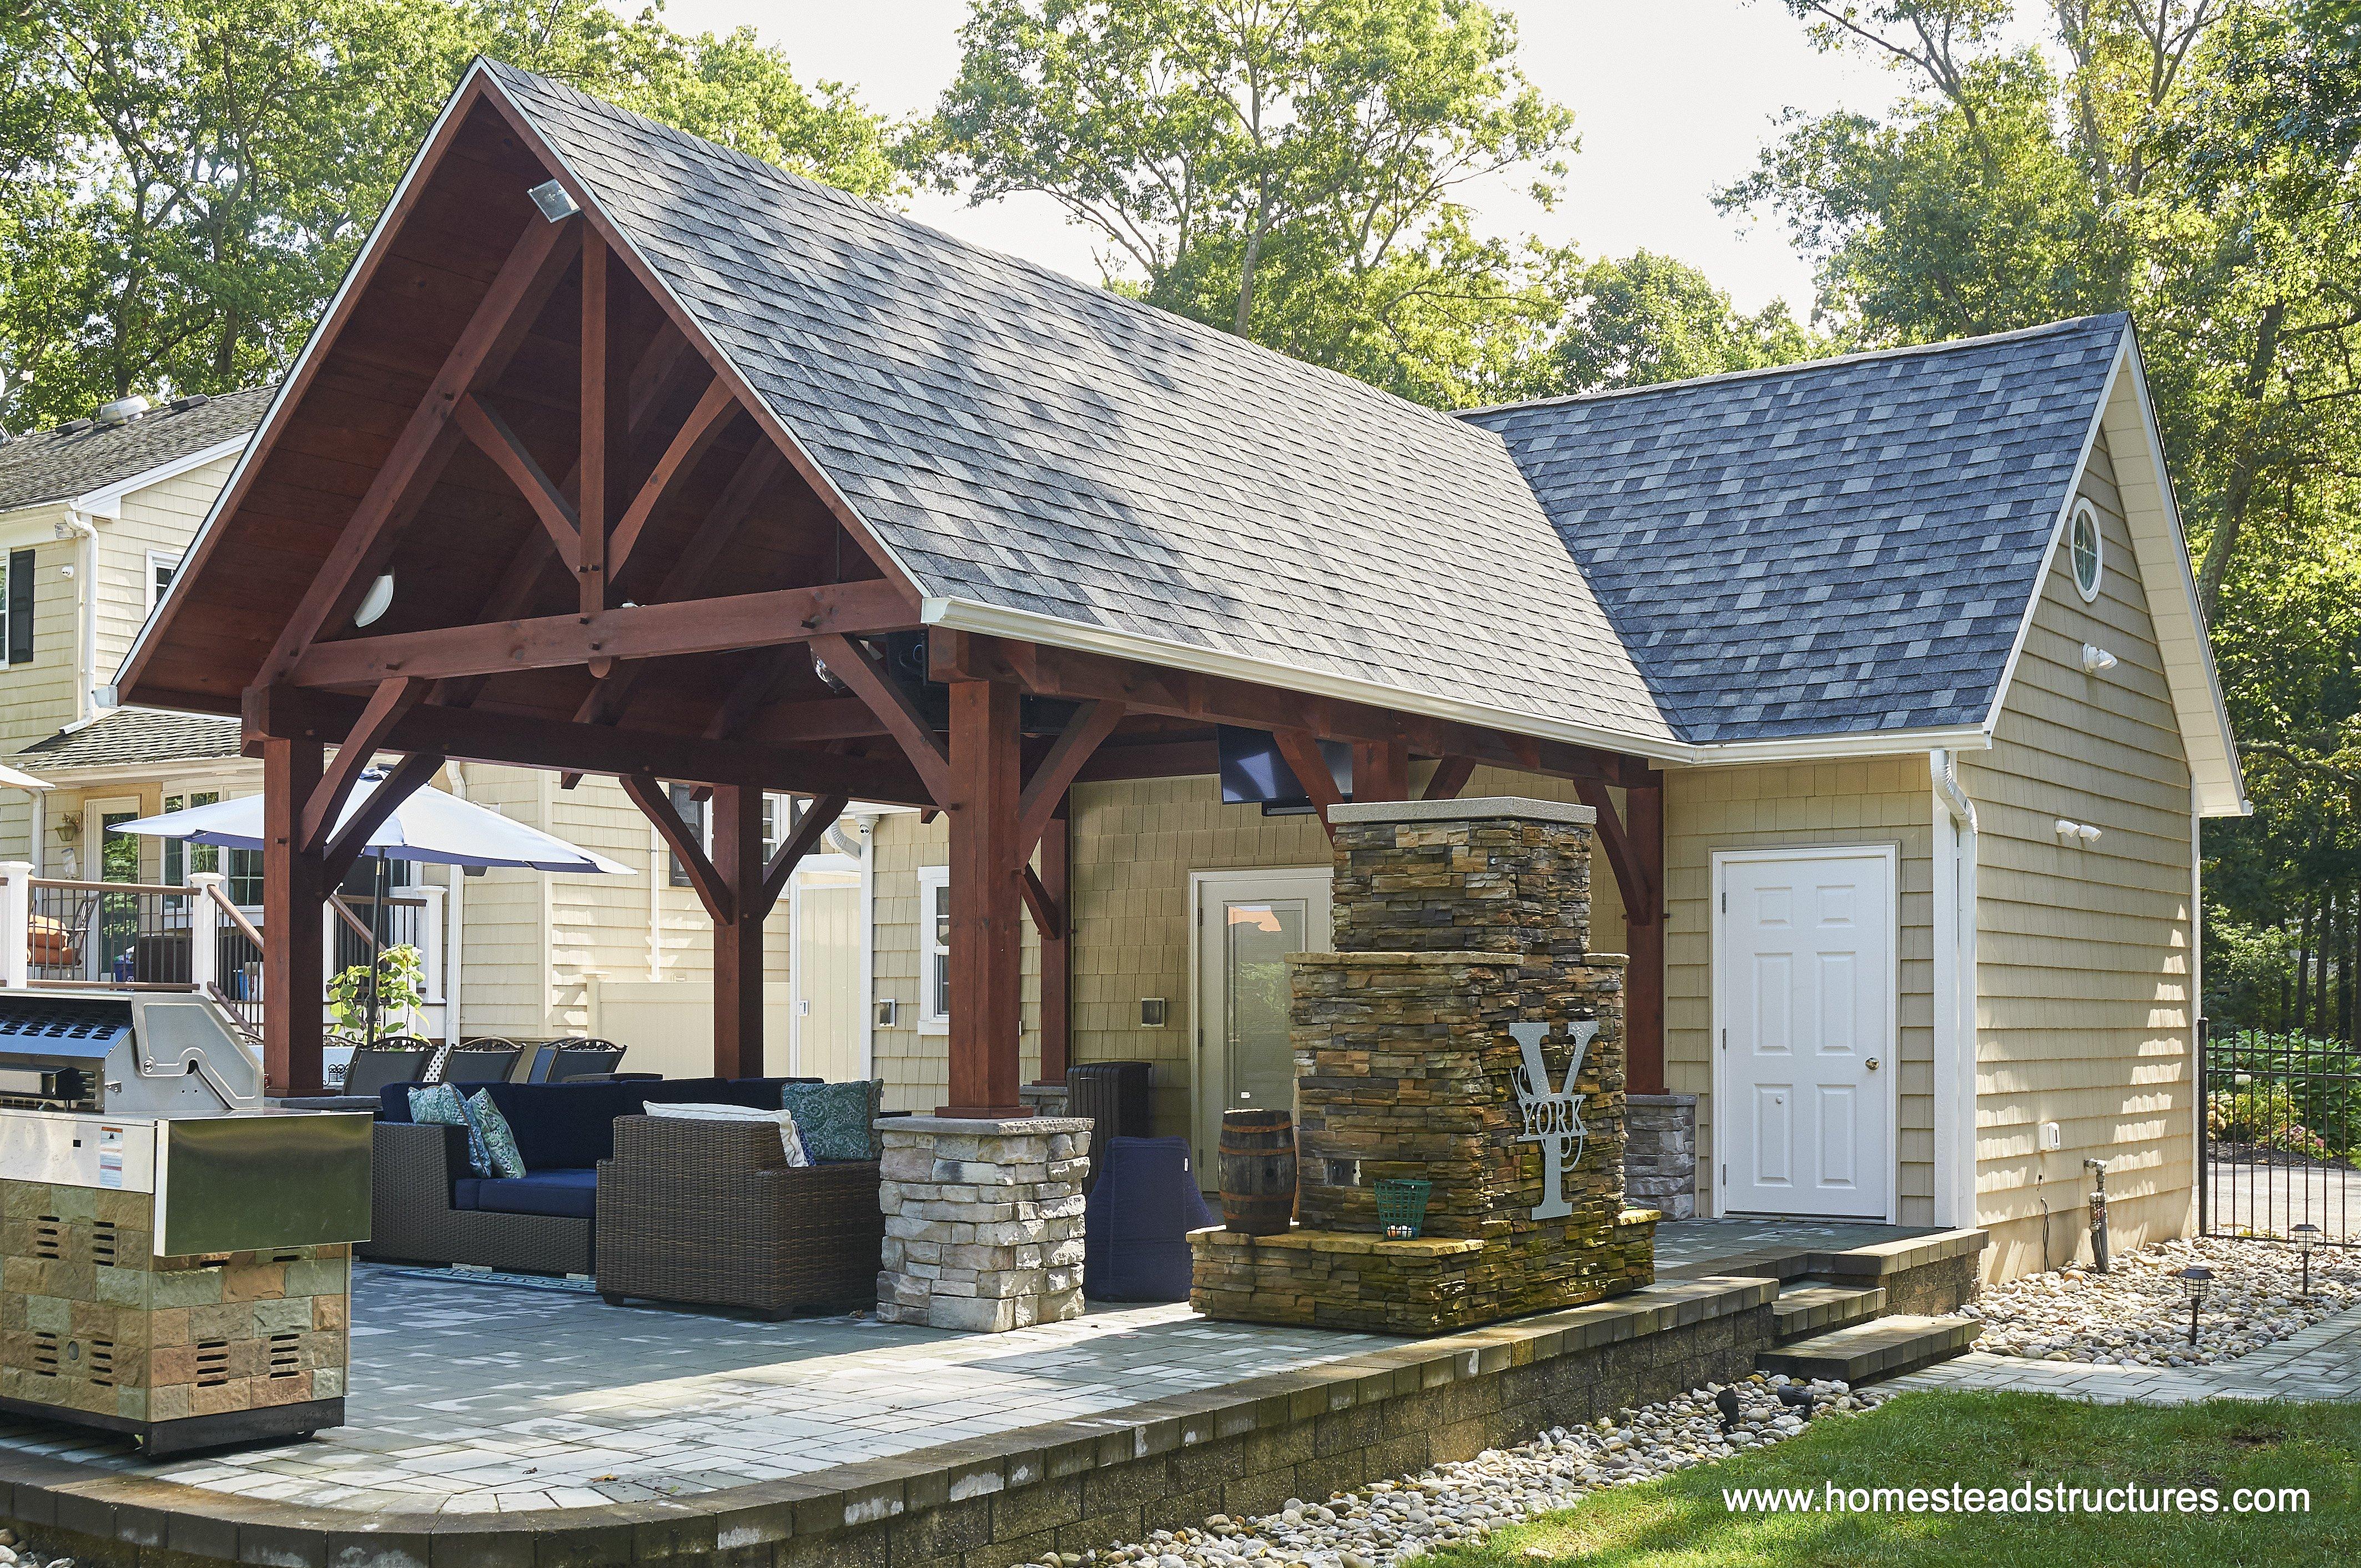 Custom Pool House Plans & Ideas - Pool Cabanas in New